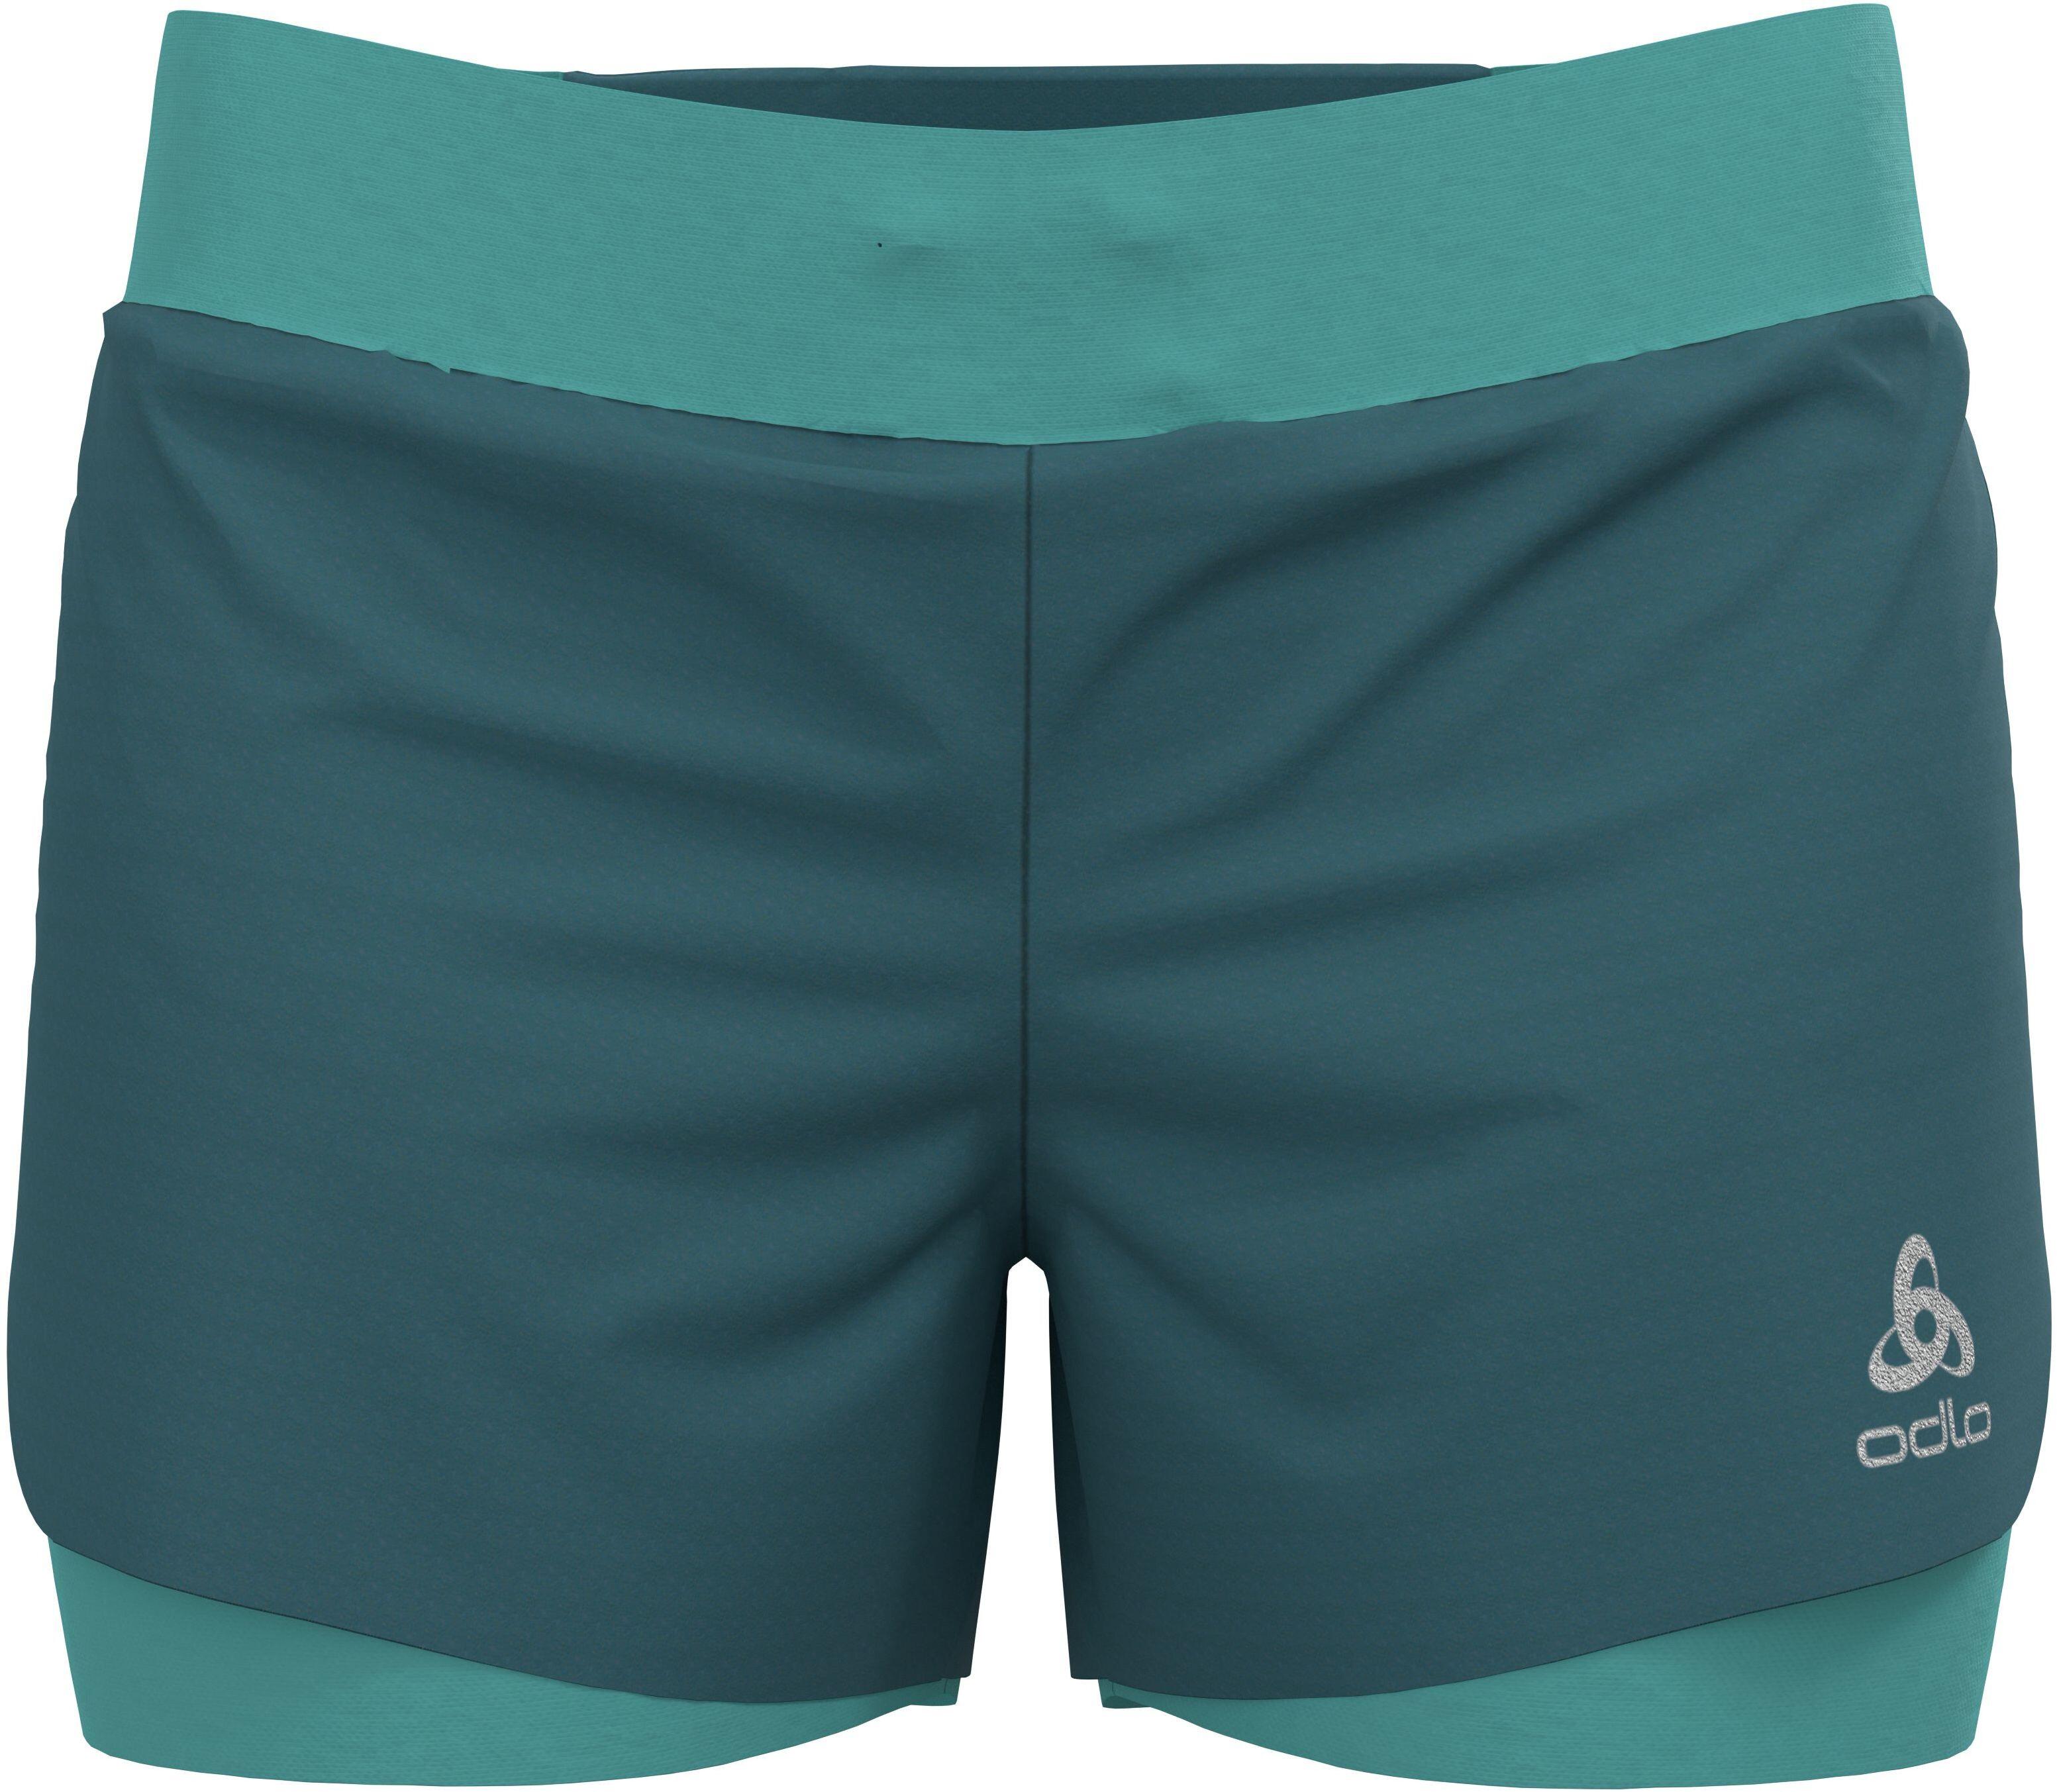 ODLO Womens Short Zeroweight ZEROWEIGHT Shorts